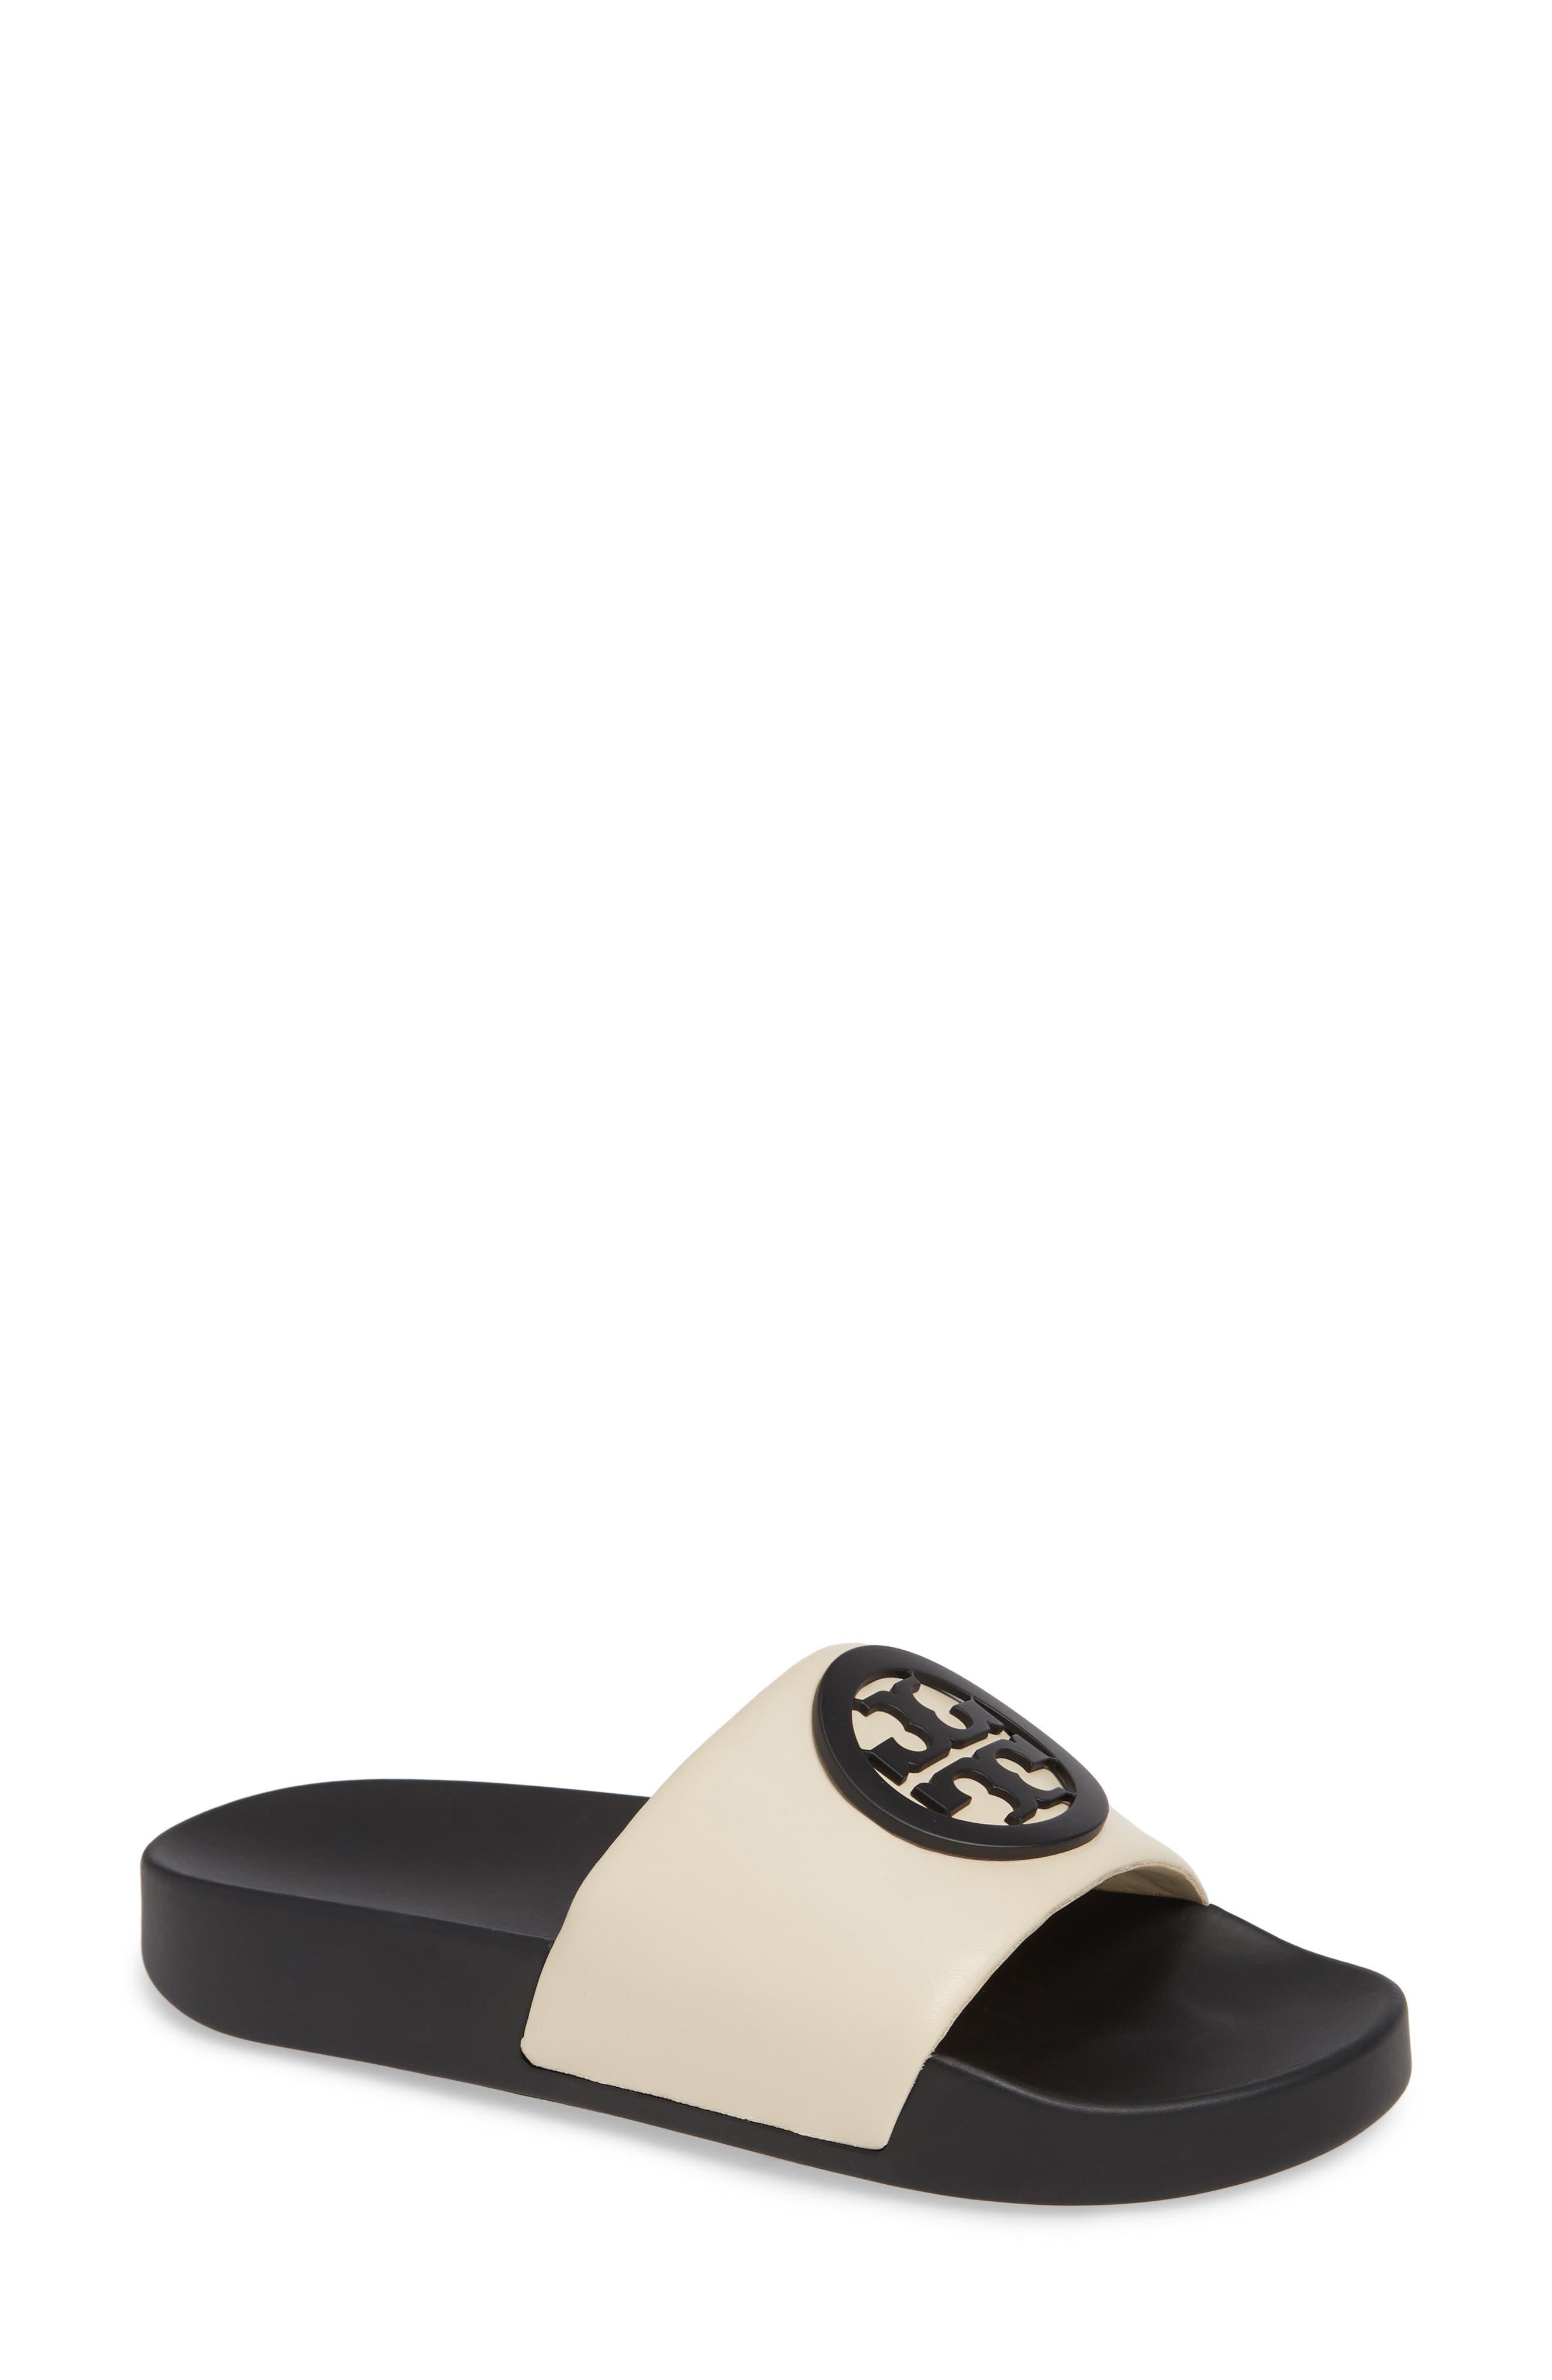 TORY BURCH Lina Slide Sandal, Main, color, NEW CREAM/ PERFECT BLACK